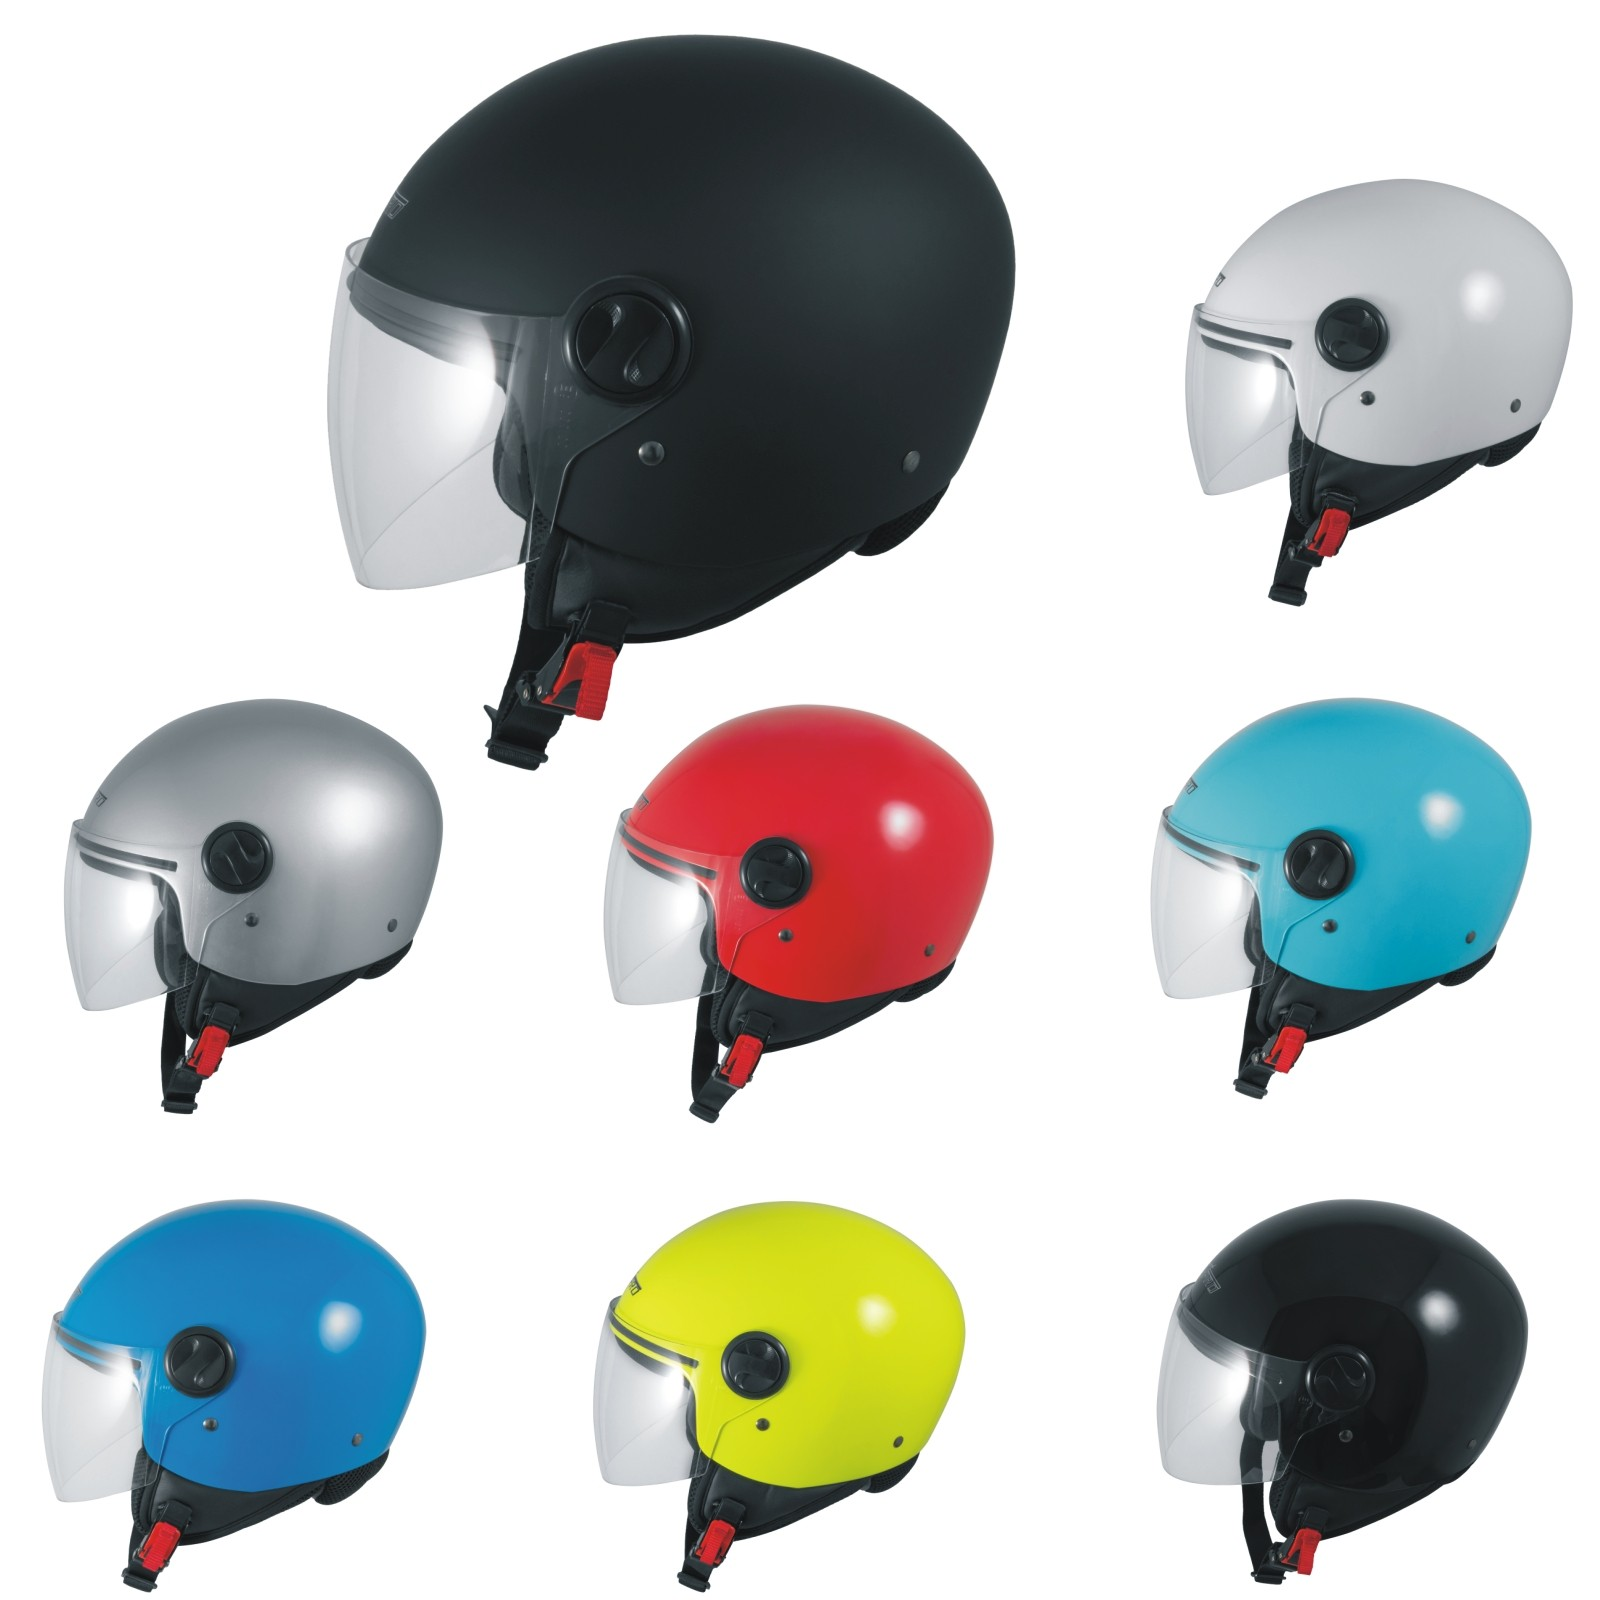 A-Pro Motorradhelm Motorrad Roller Jet Helm Innensonnenblende Viser Schwarz Matt 2XL